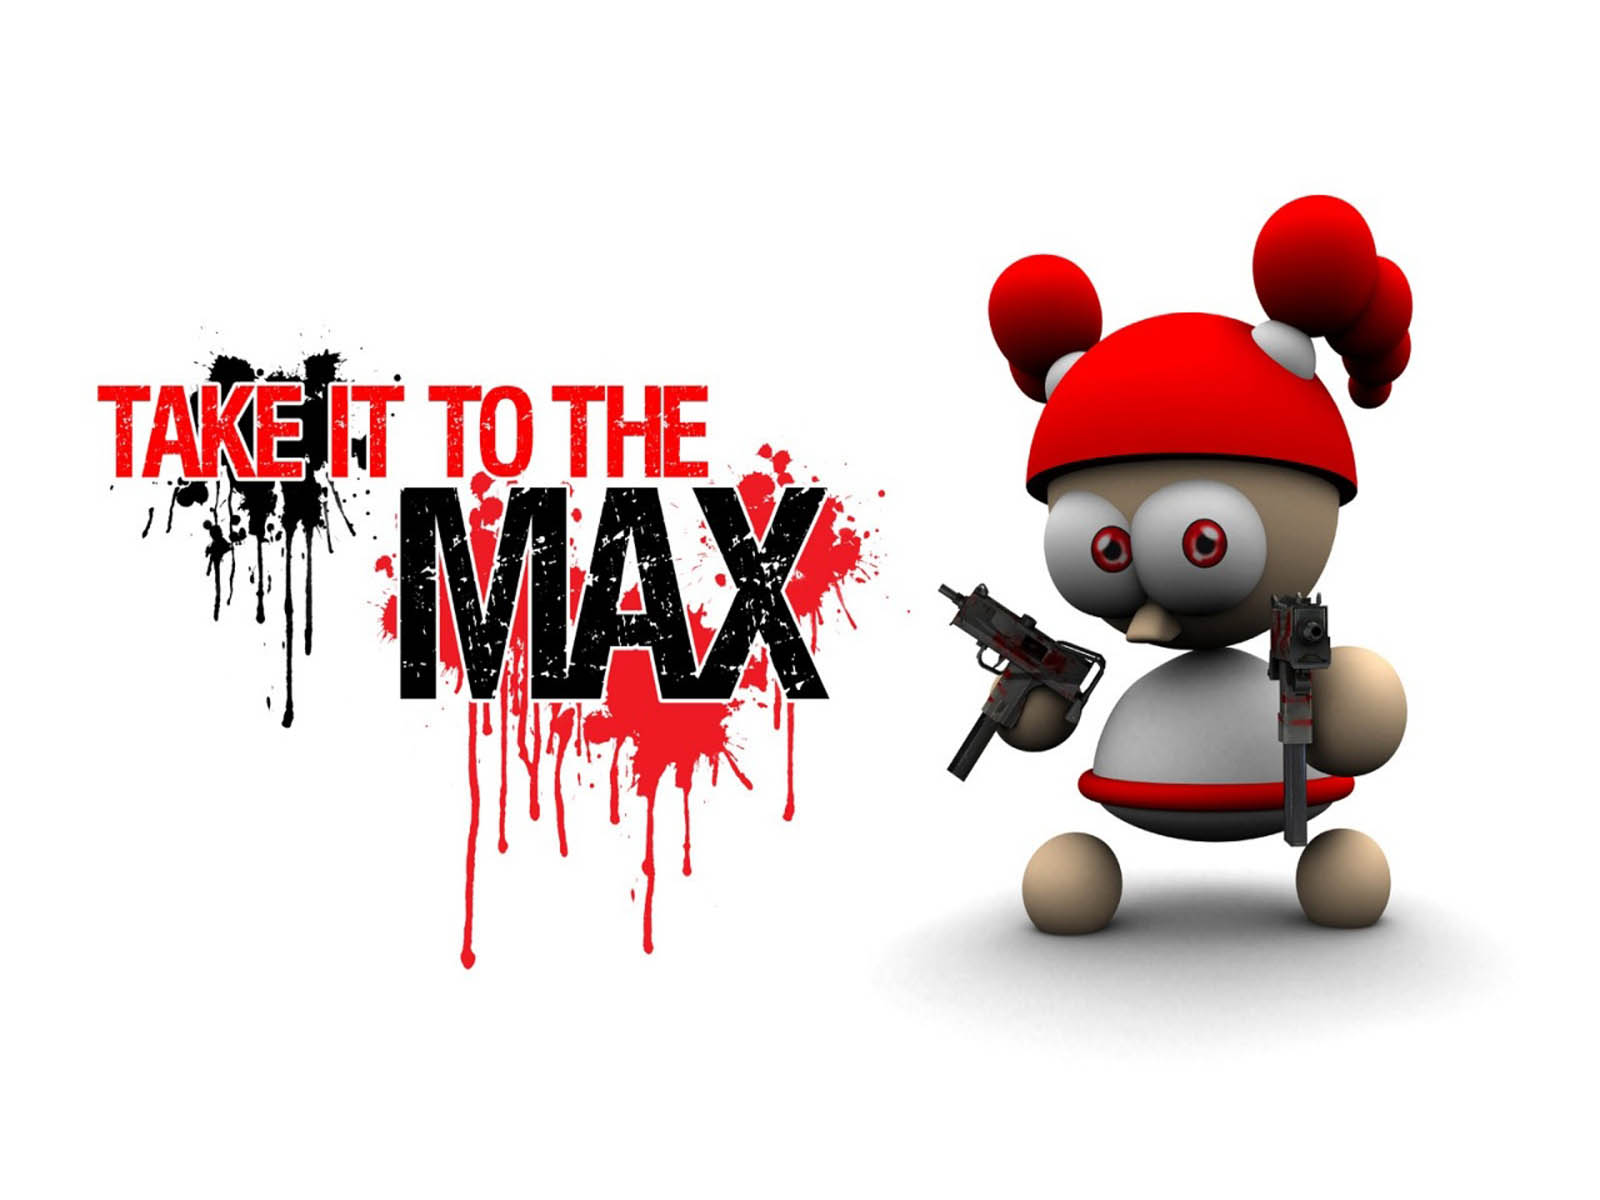 69e18332e2 Take it to the Max Wallpaper Take it to the Max Wallpaper 1600x1200